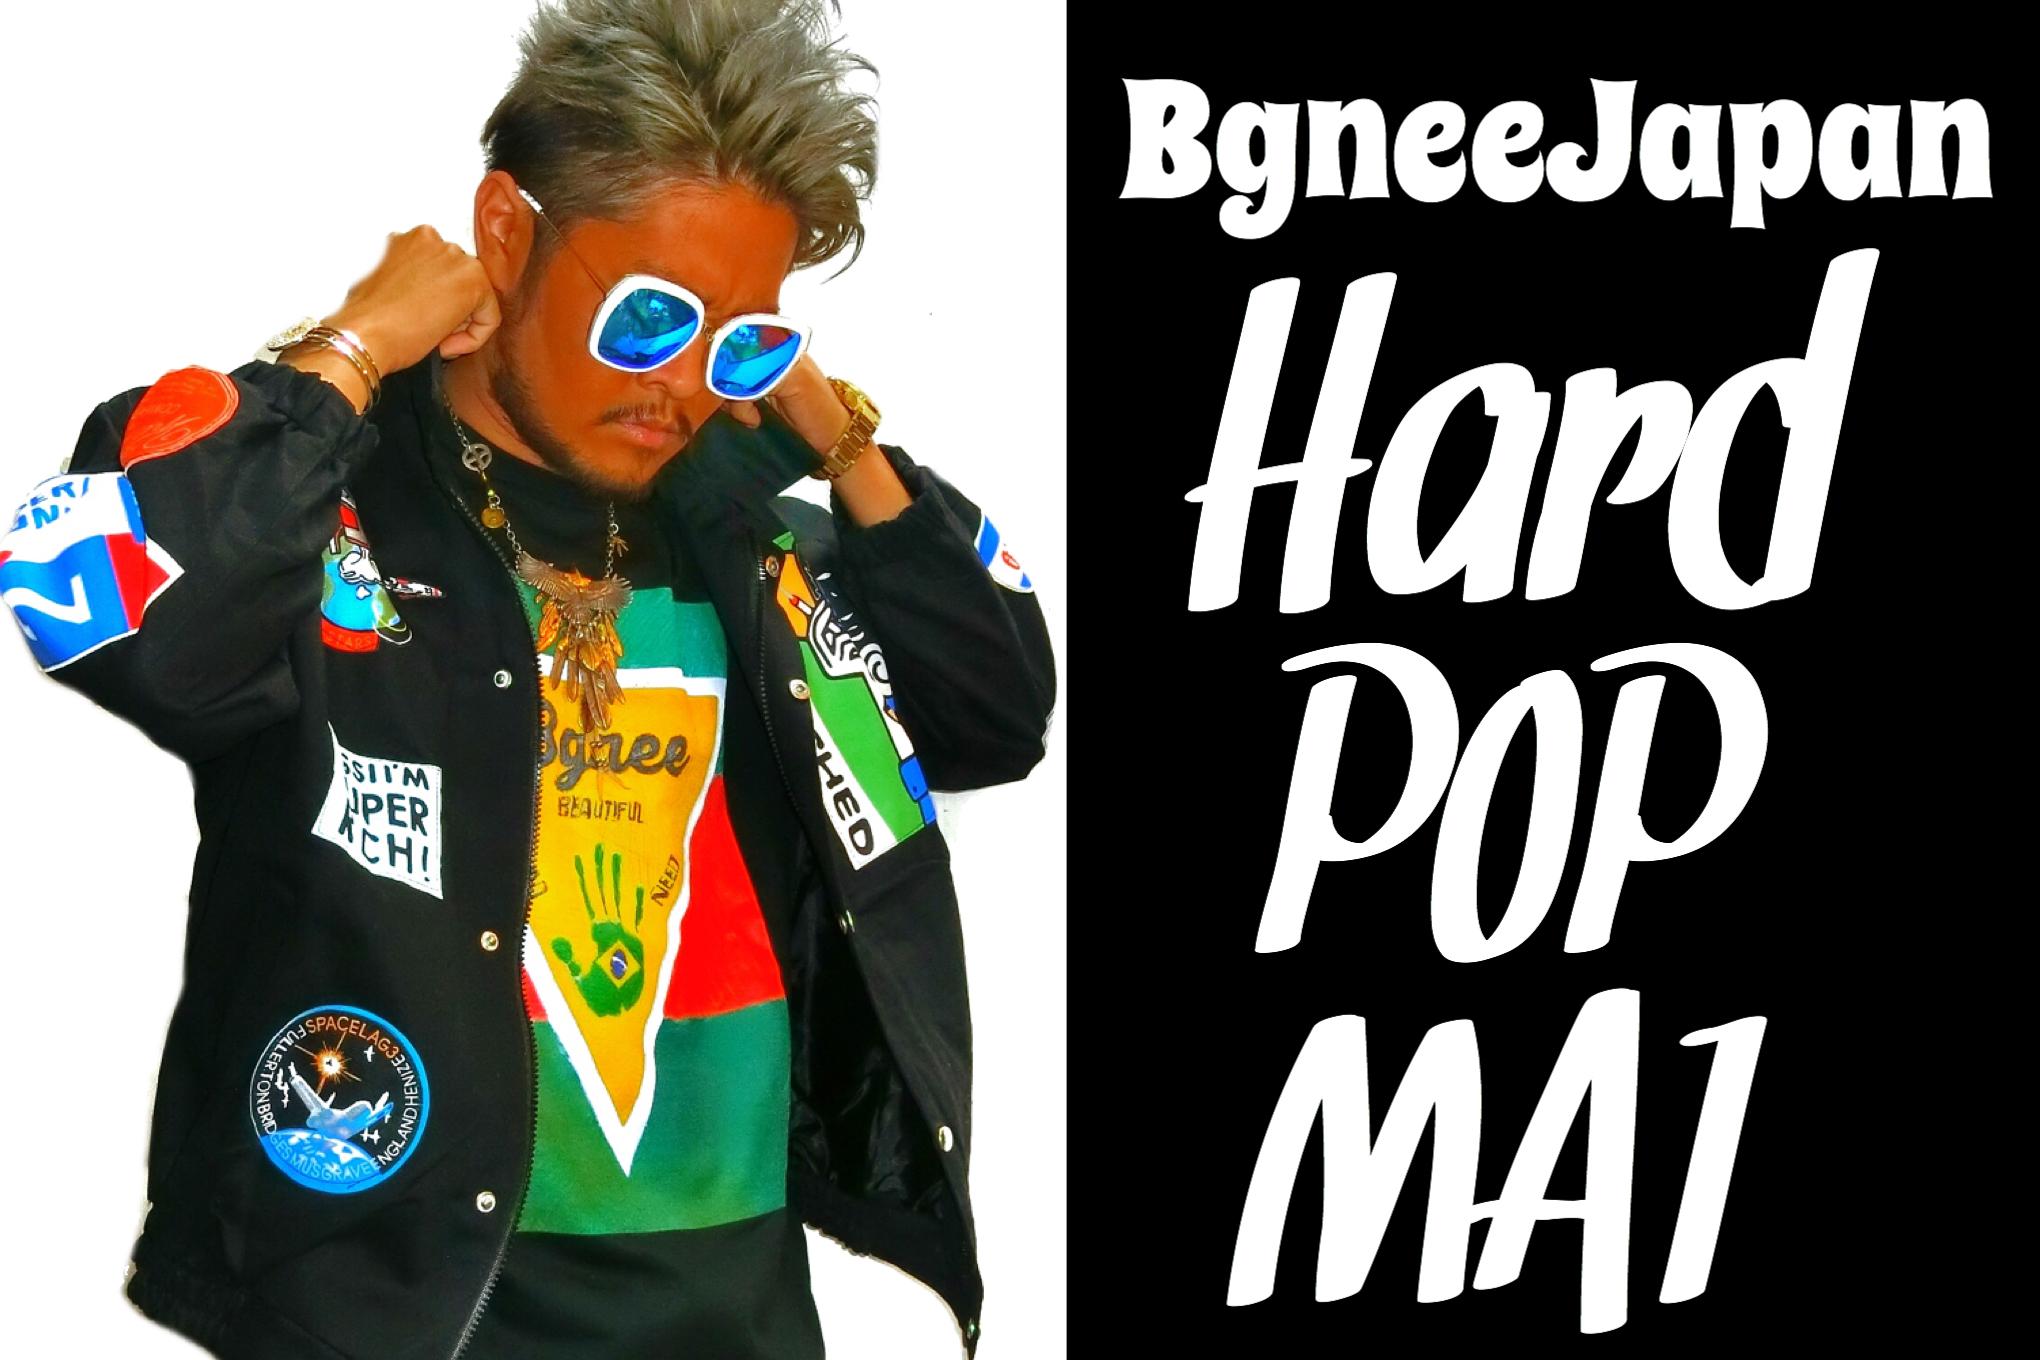 Bgnee hard pop MA1